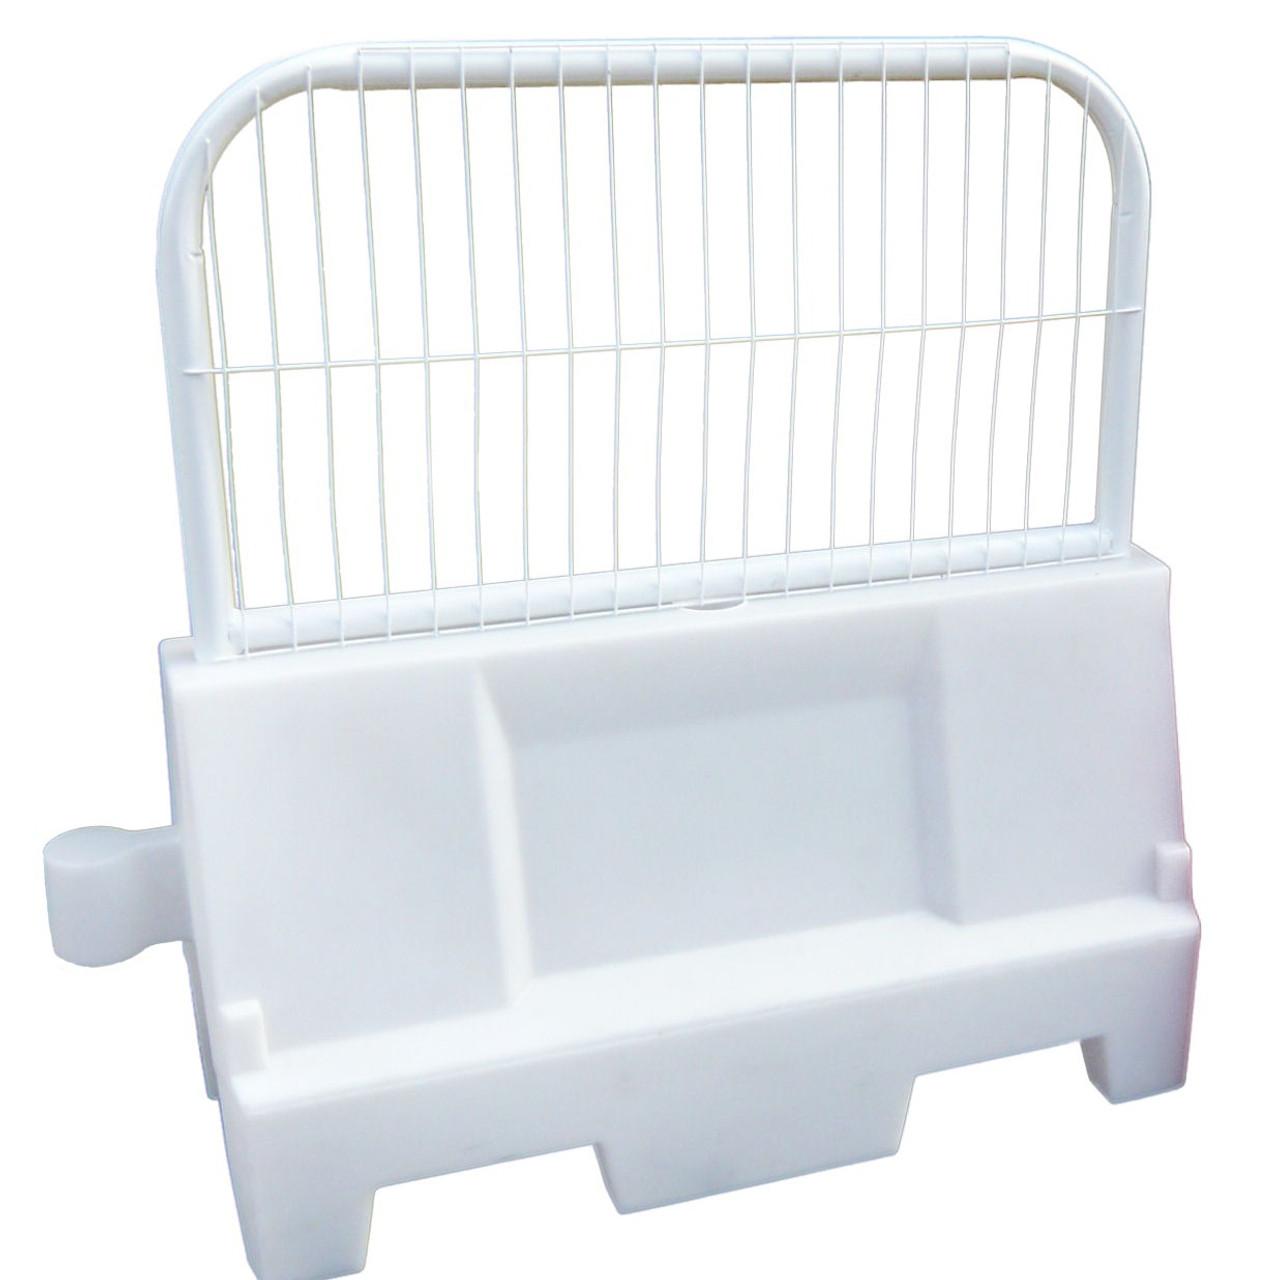 Evo 1.5 metre water barrier mini mesh panel